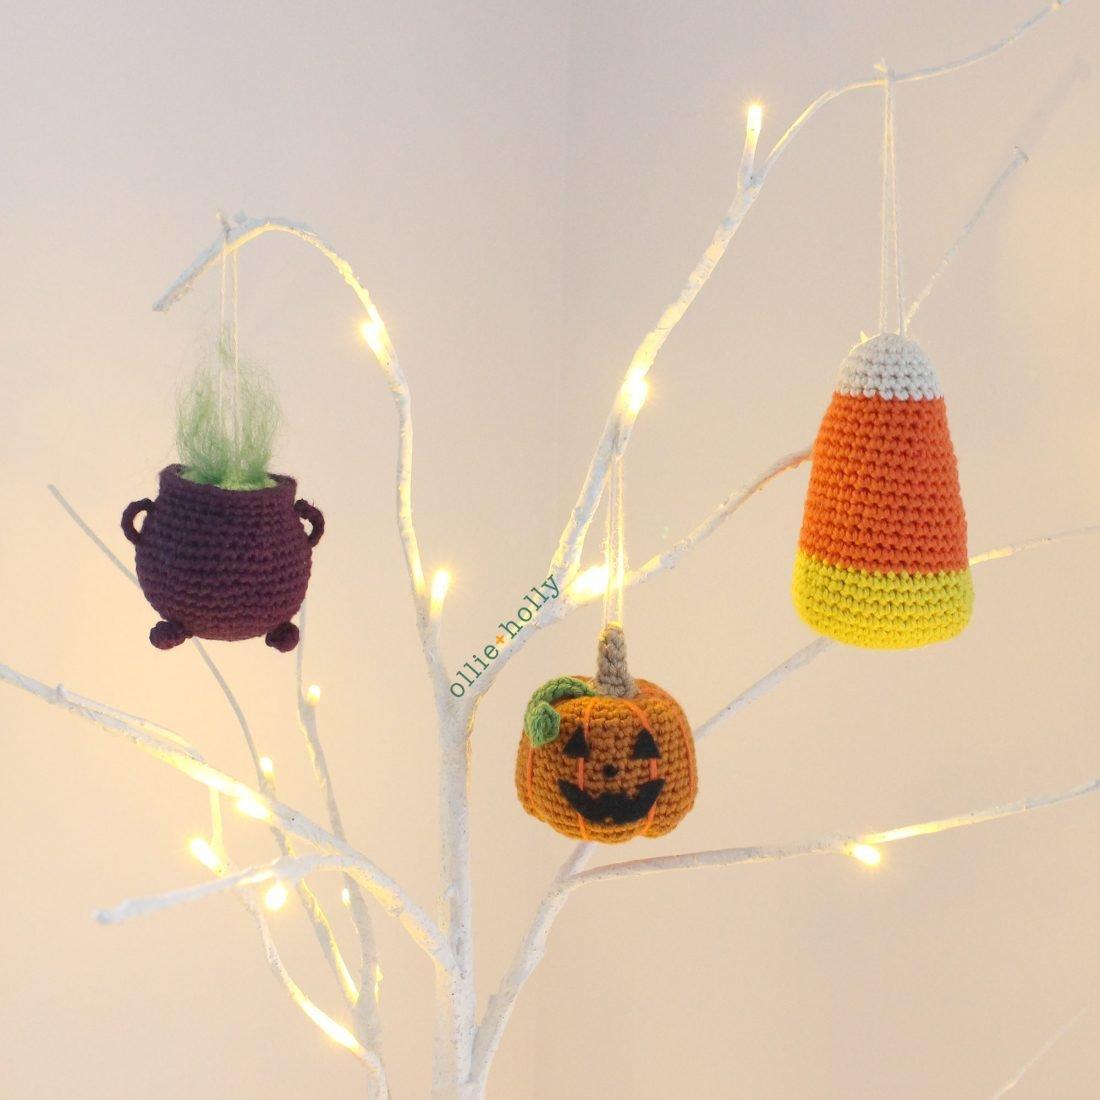 Trick or Treat Amigurumi Crochet Ornaments (Pattern Collection)